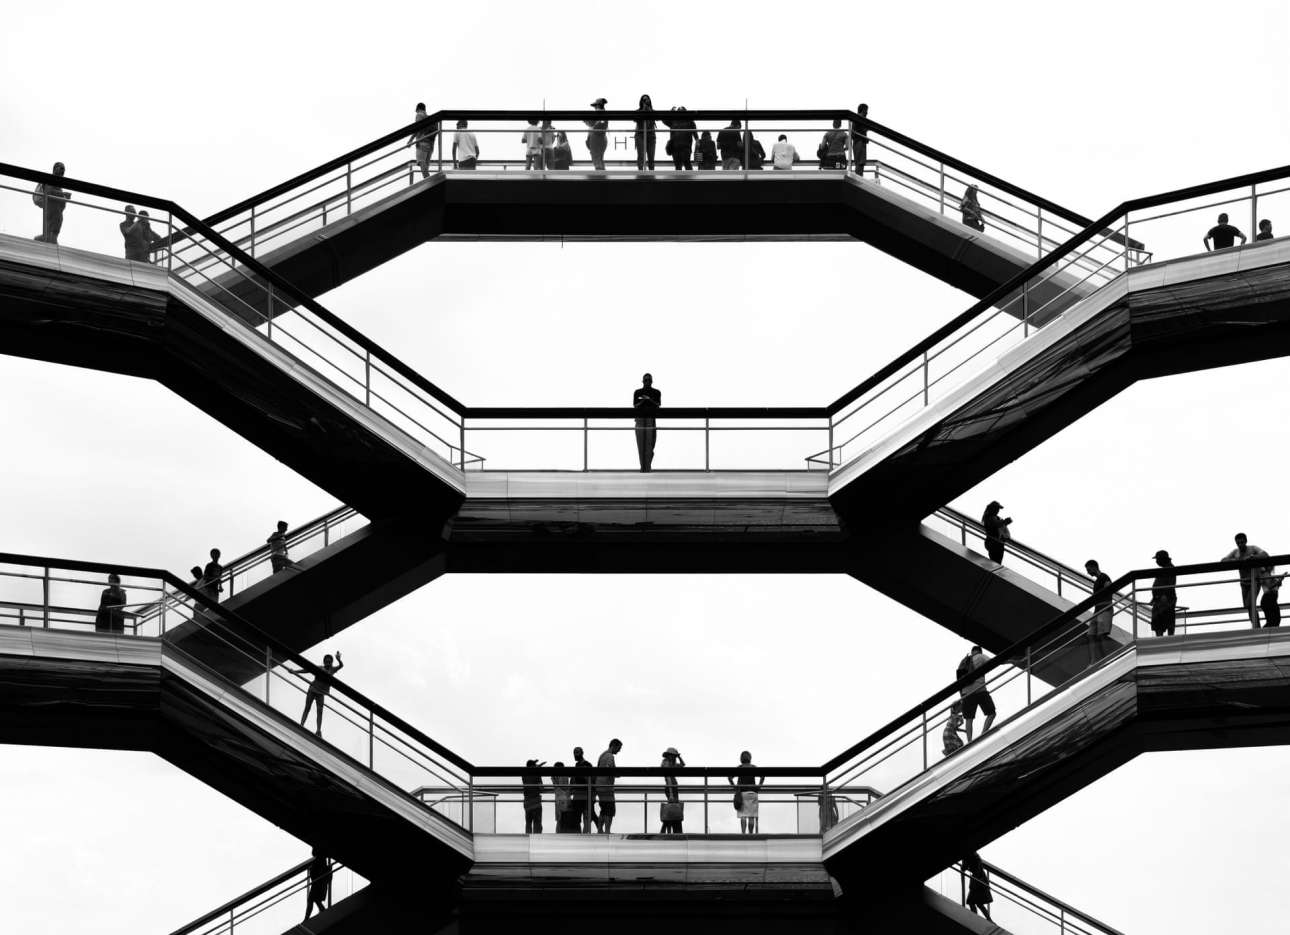 «The Vessel», Νέα Υόρκη, ΗΠΑ, γραφείο Heatherwick Studio, στην κατηγορία «Κτίρια σε Χρήση»